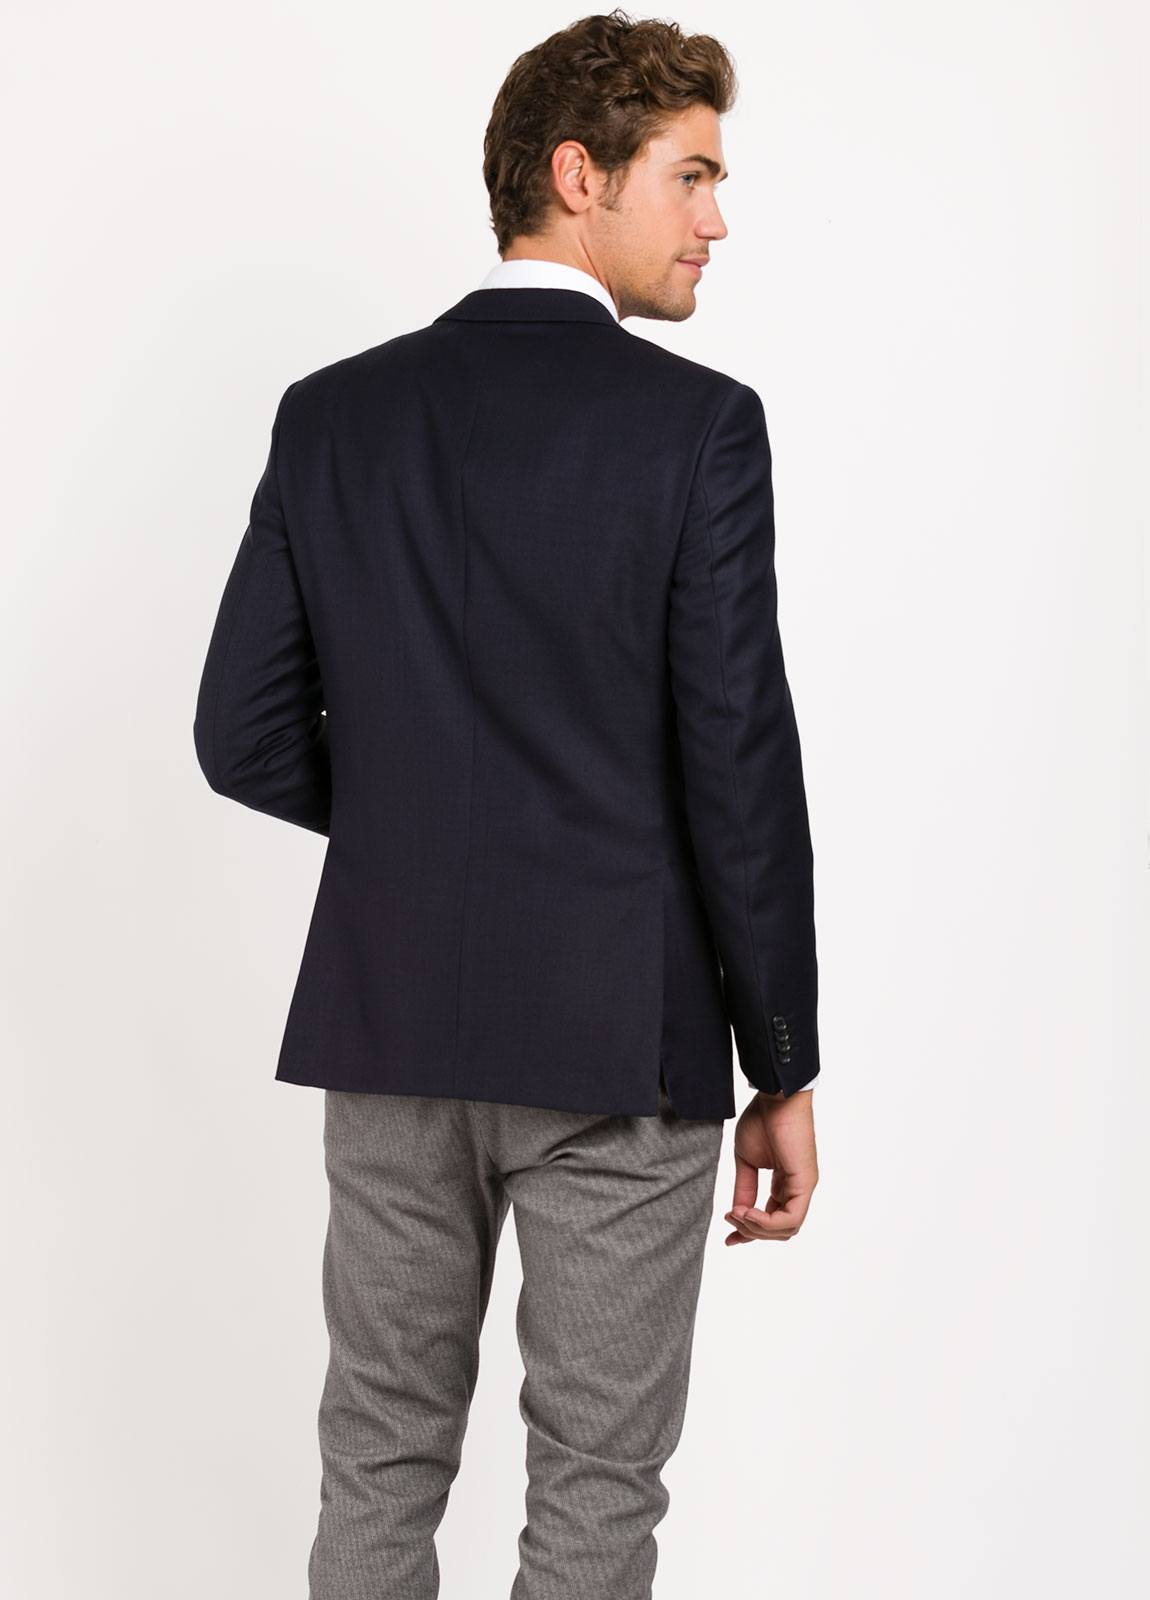 Americana SOFT JACKET Regular Fit, tejido Marzotto textura color azul marino, Lana. - Ítem4